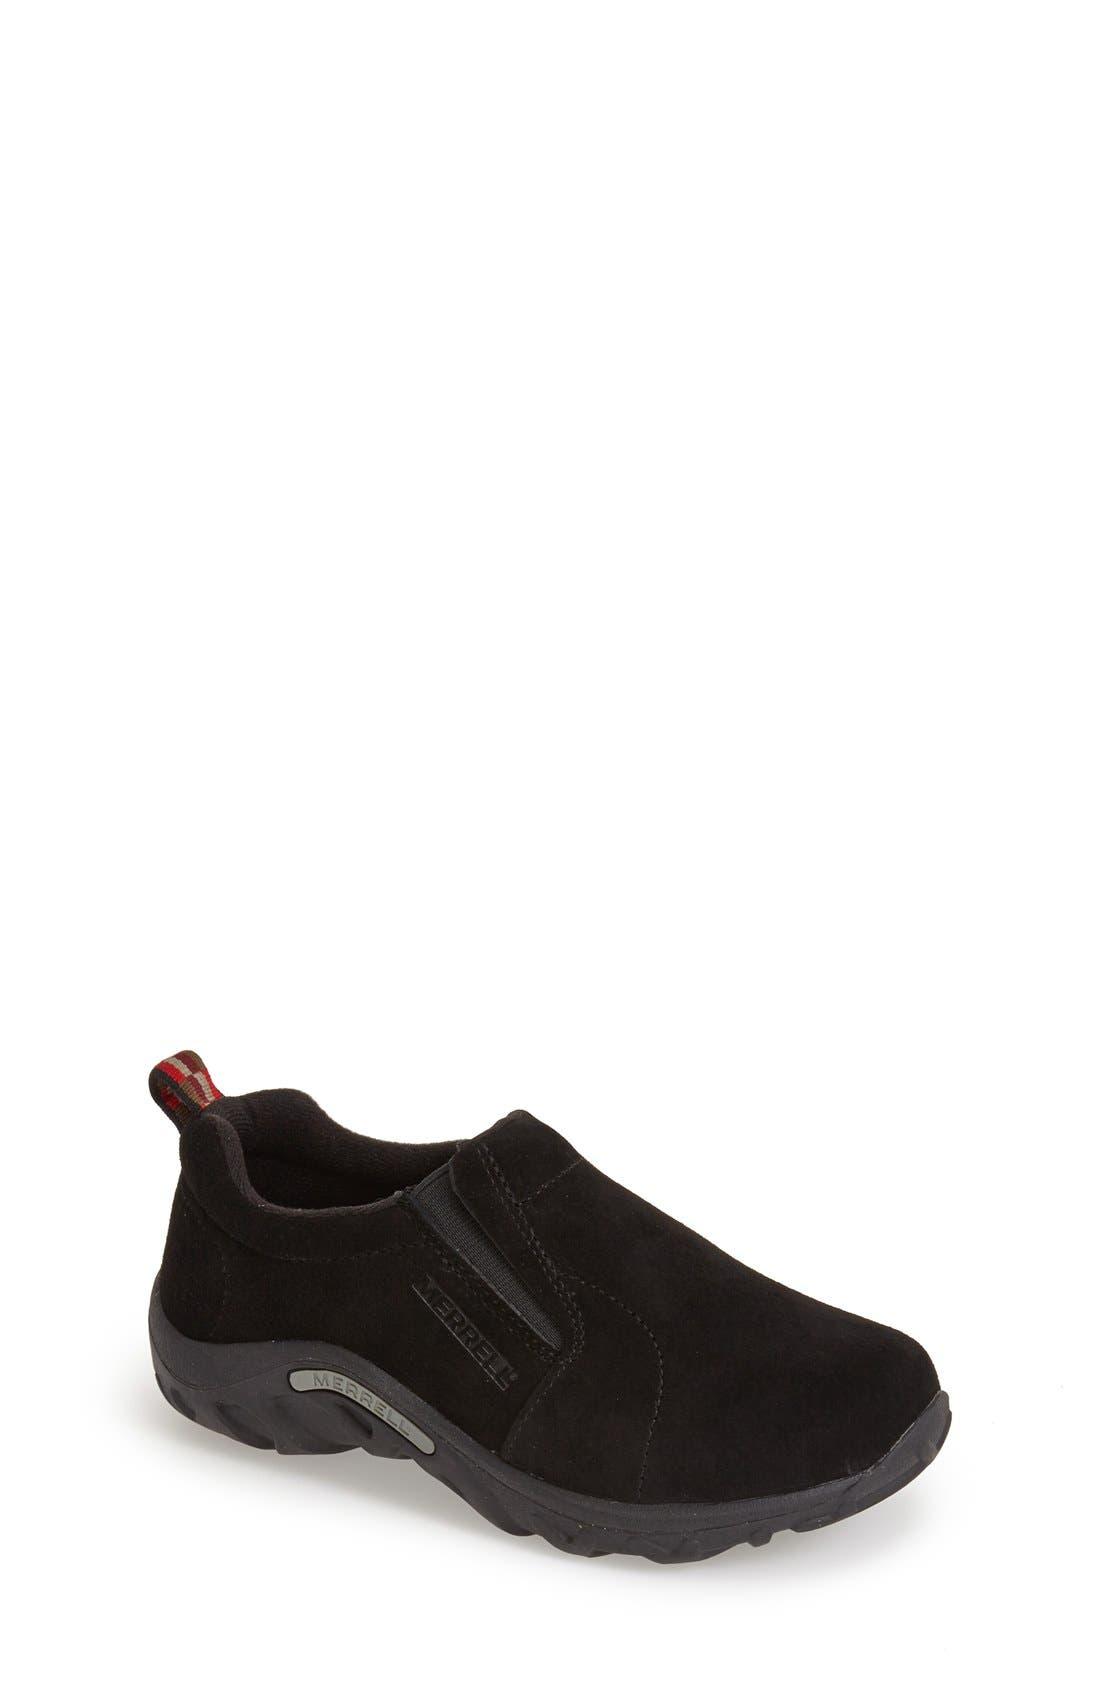 MERRELL 'Jungle Moc' Slip-On, Main, color, BLACK